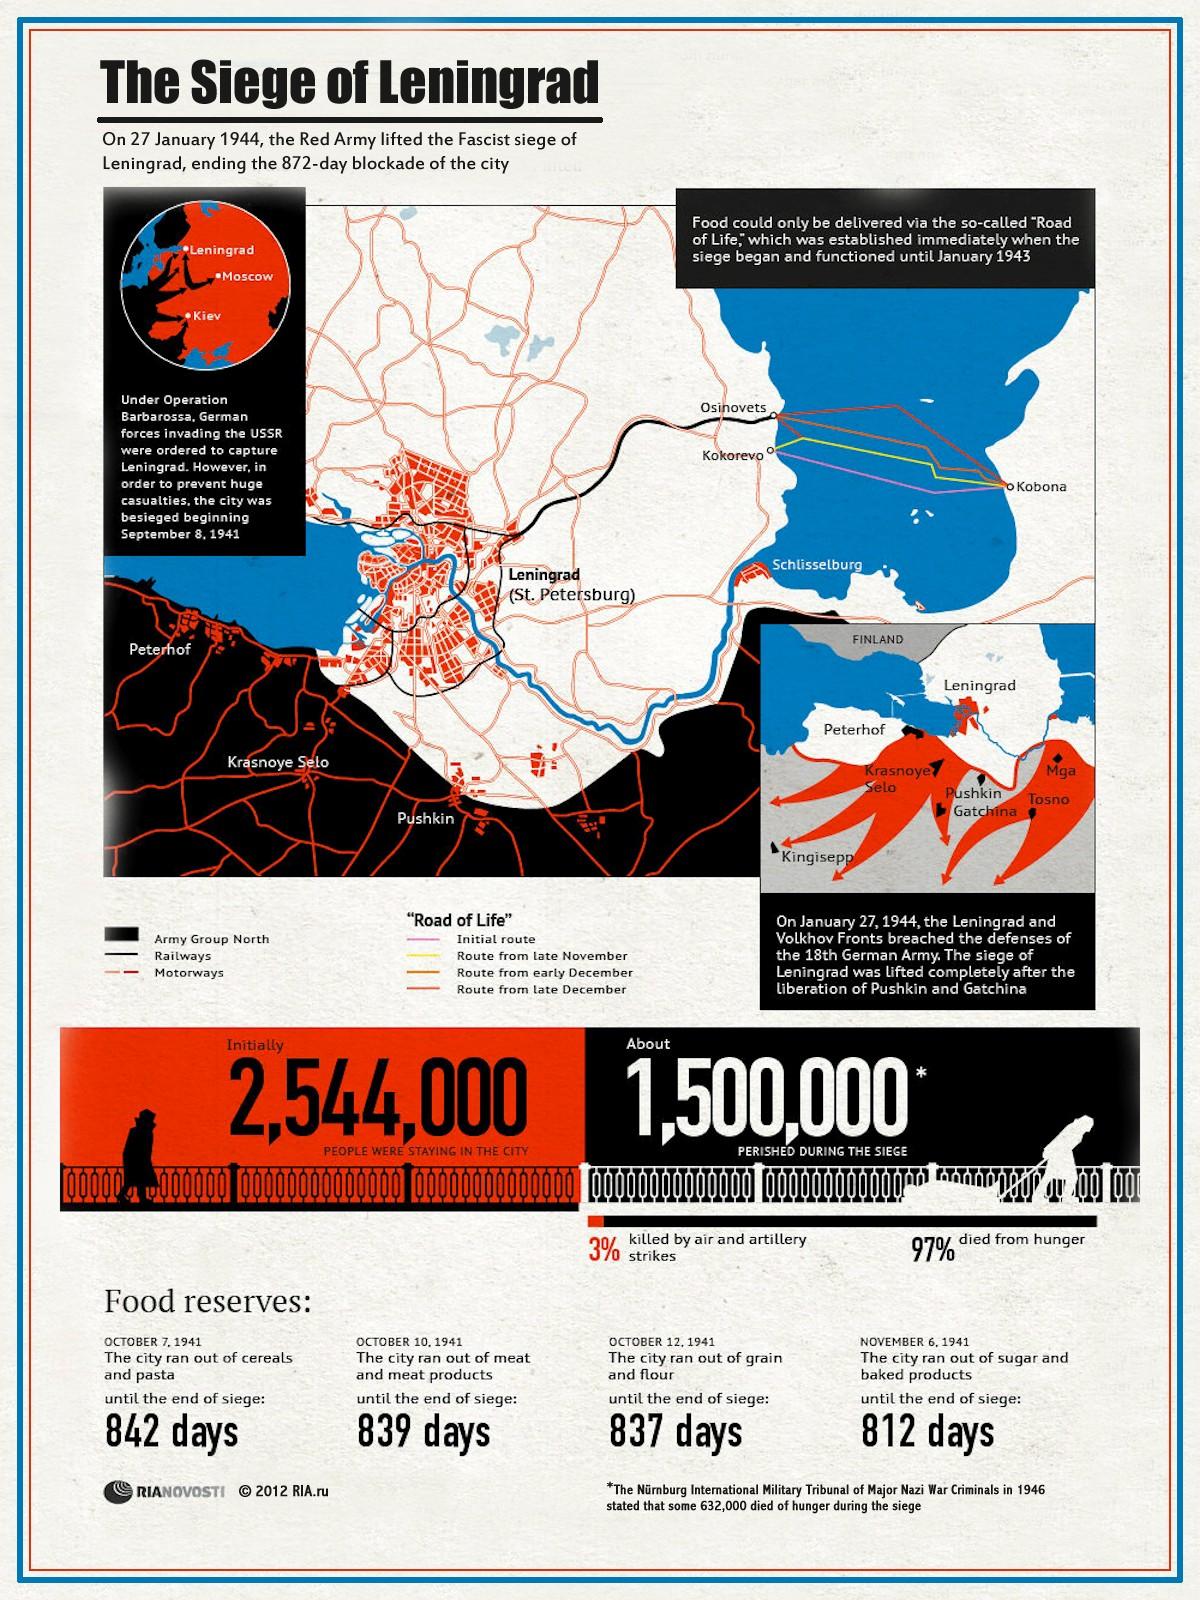 00 RIA-Novosti Infographics. The Siege of Leningrad. 2012